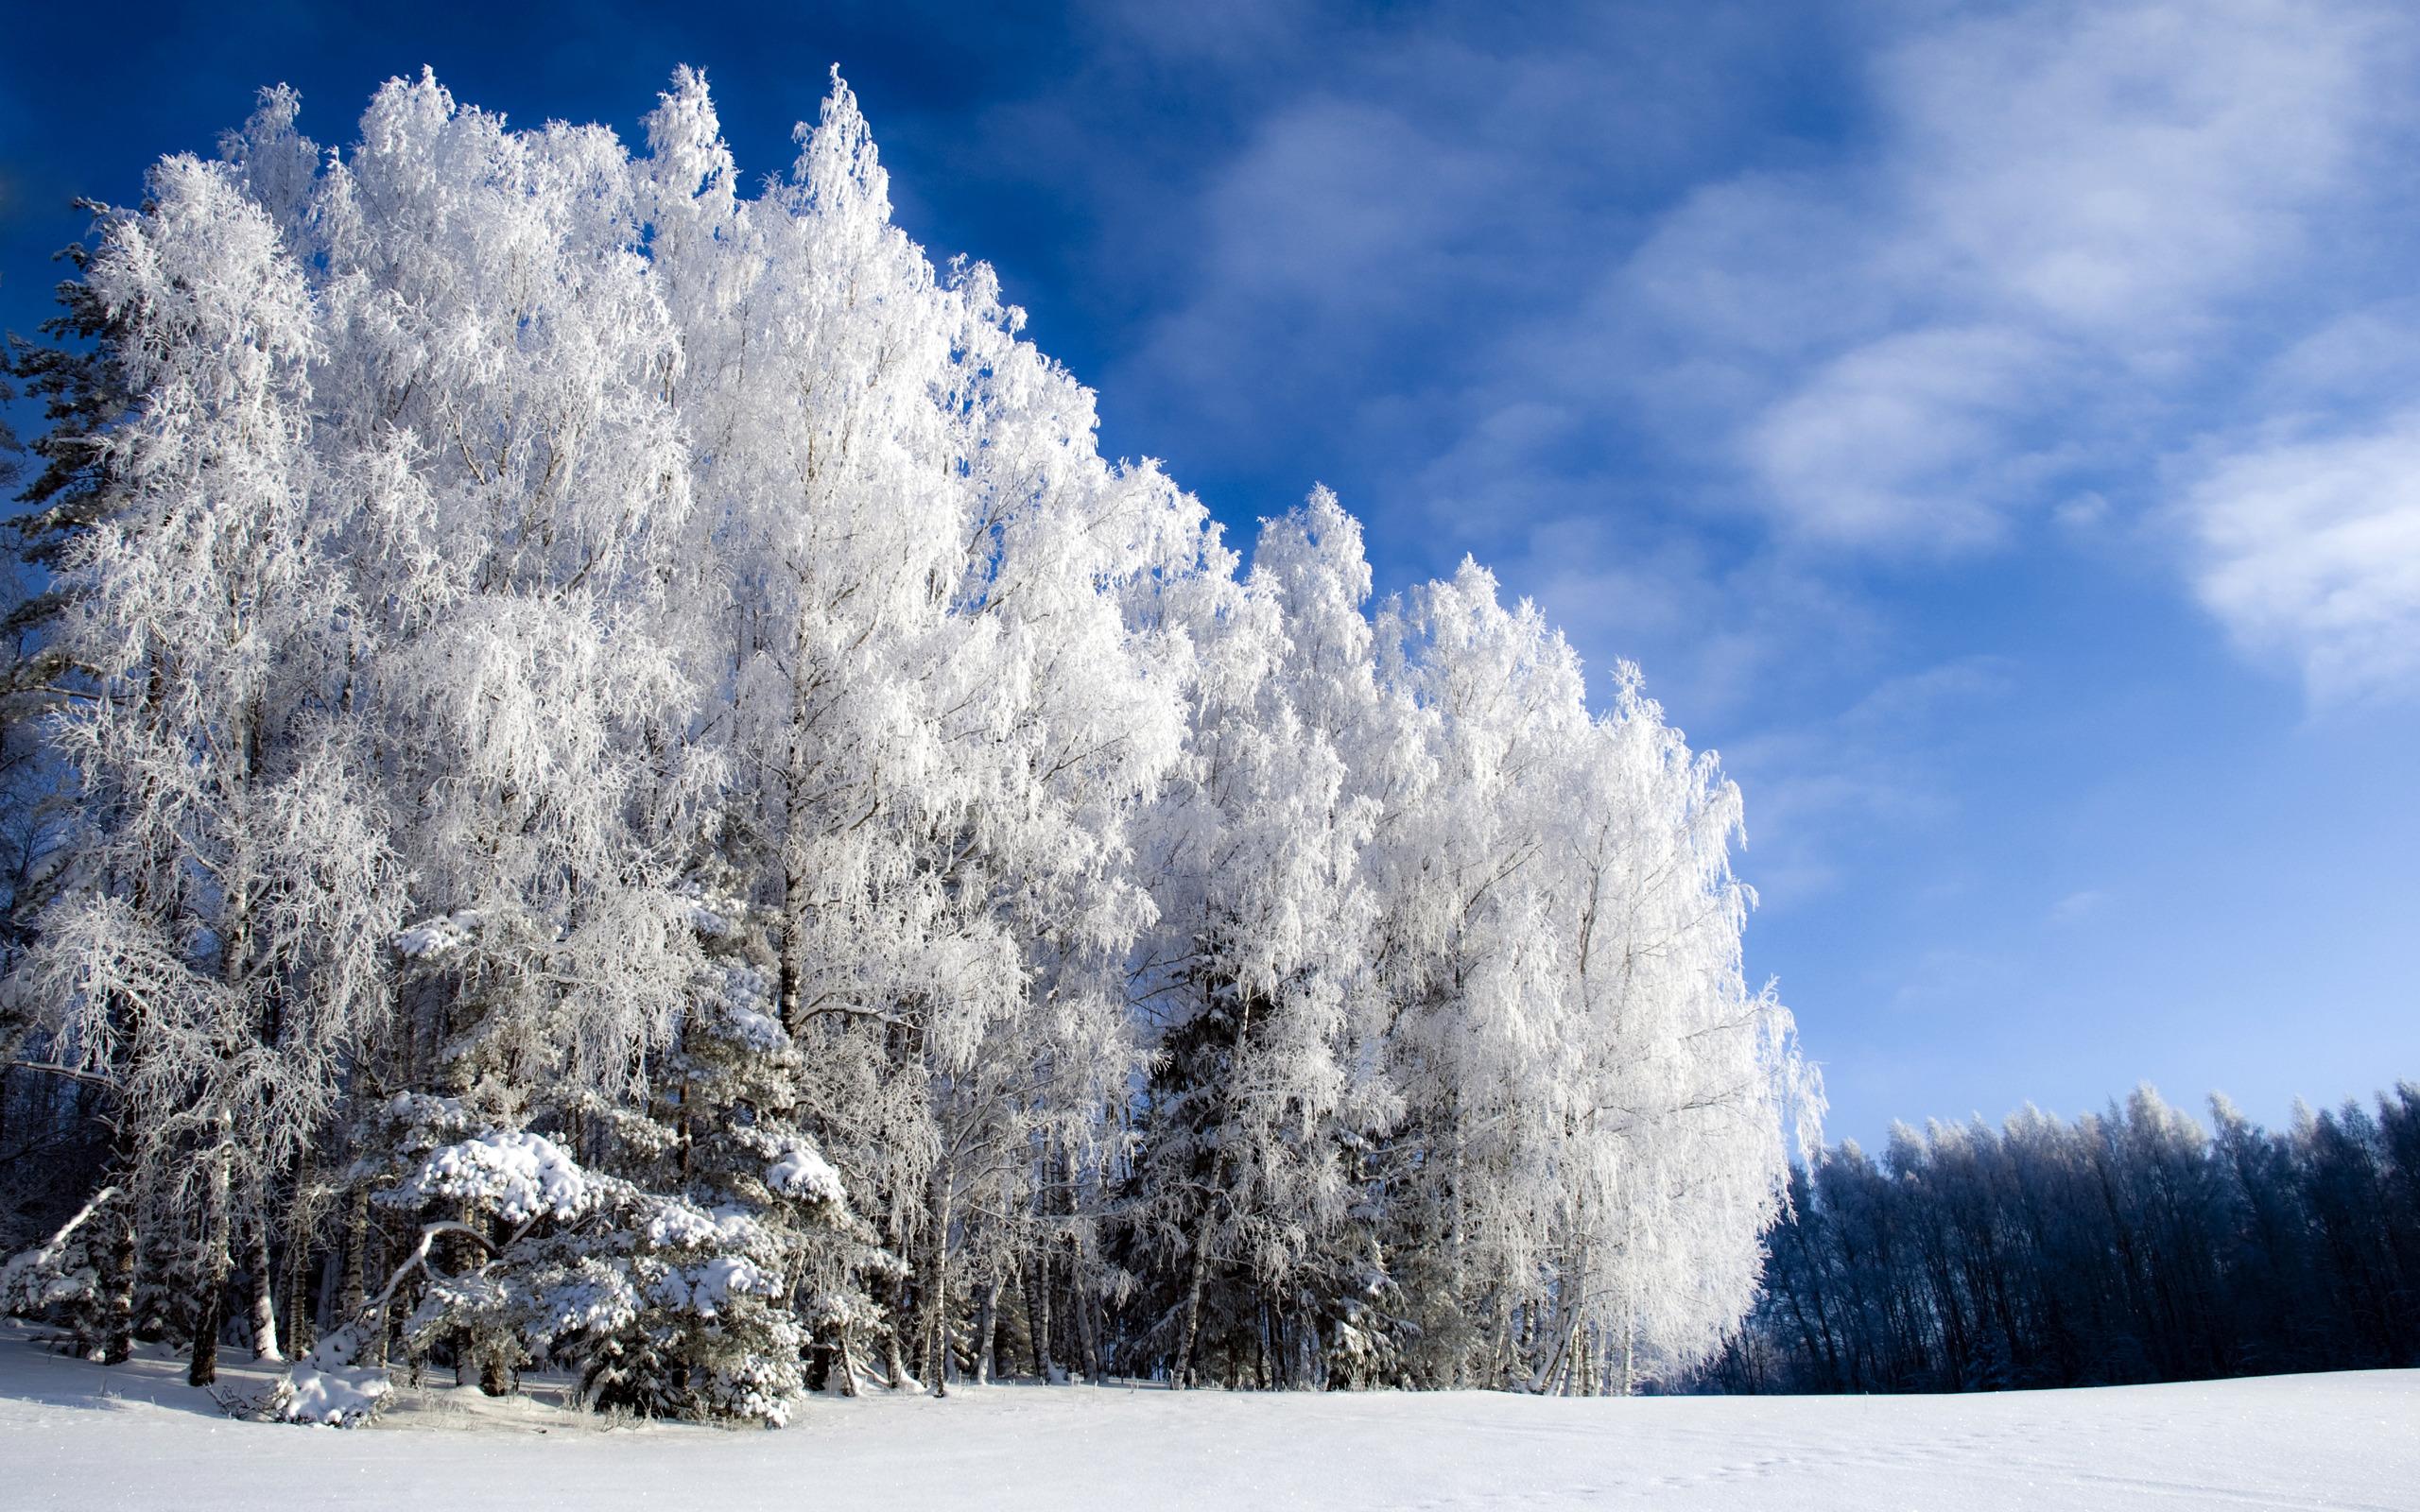 Зима, небо, снег, фото, обои, скачать, красиво